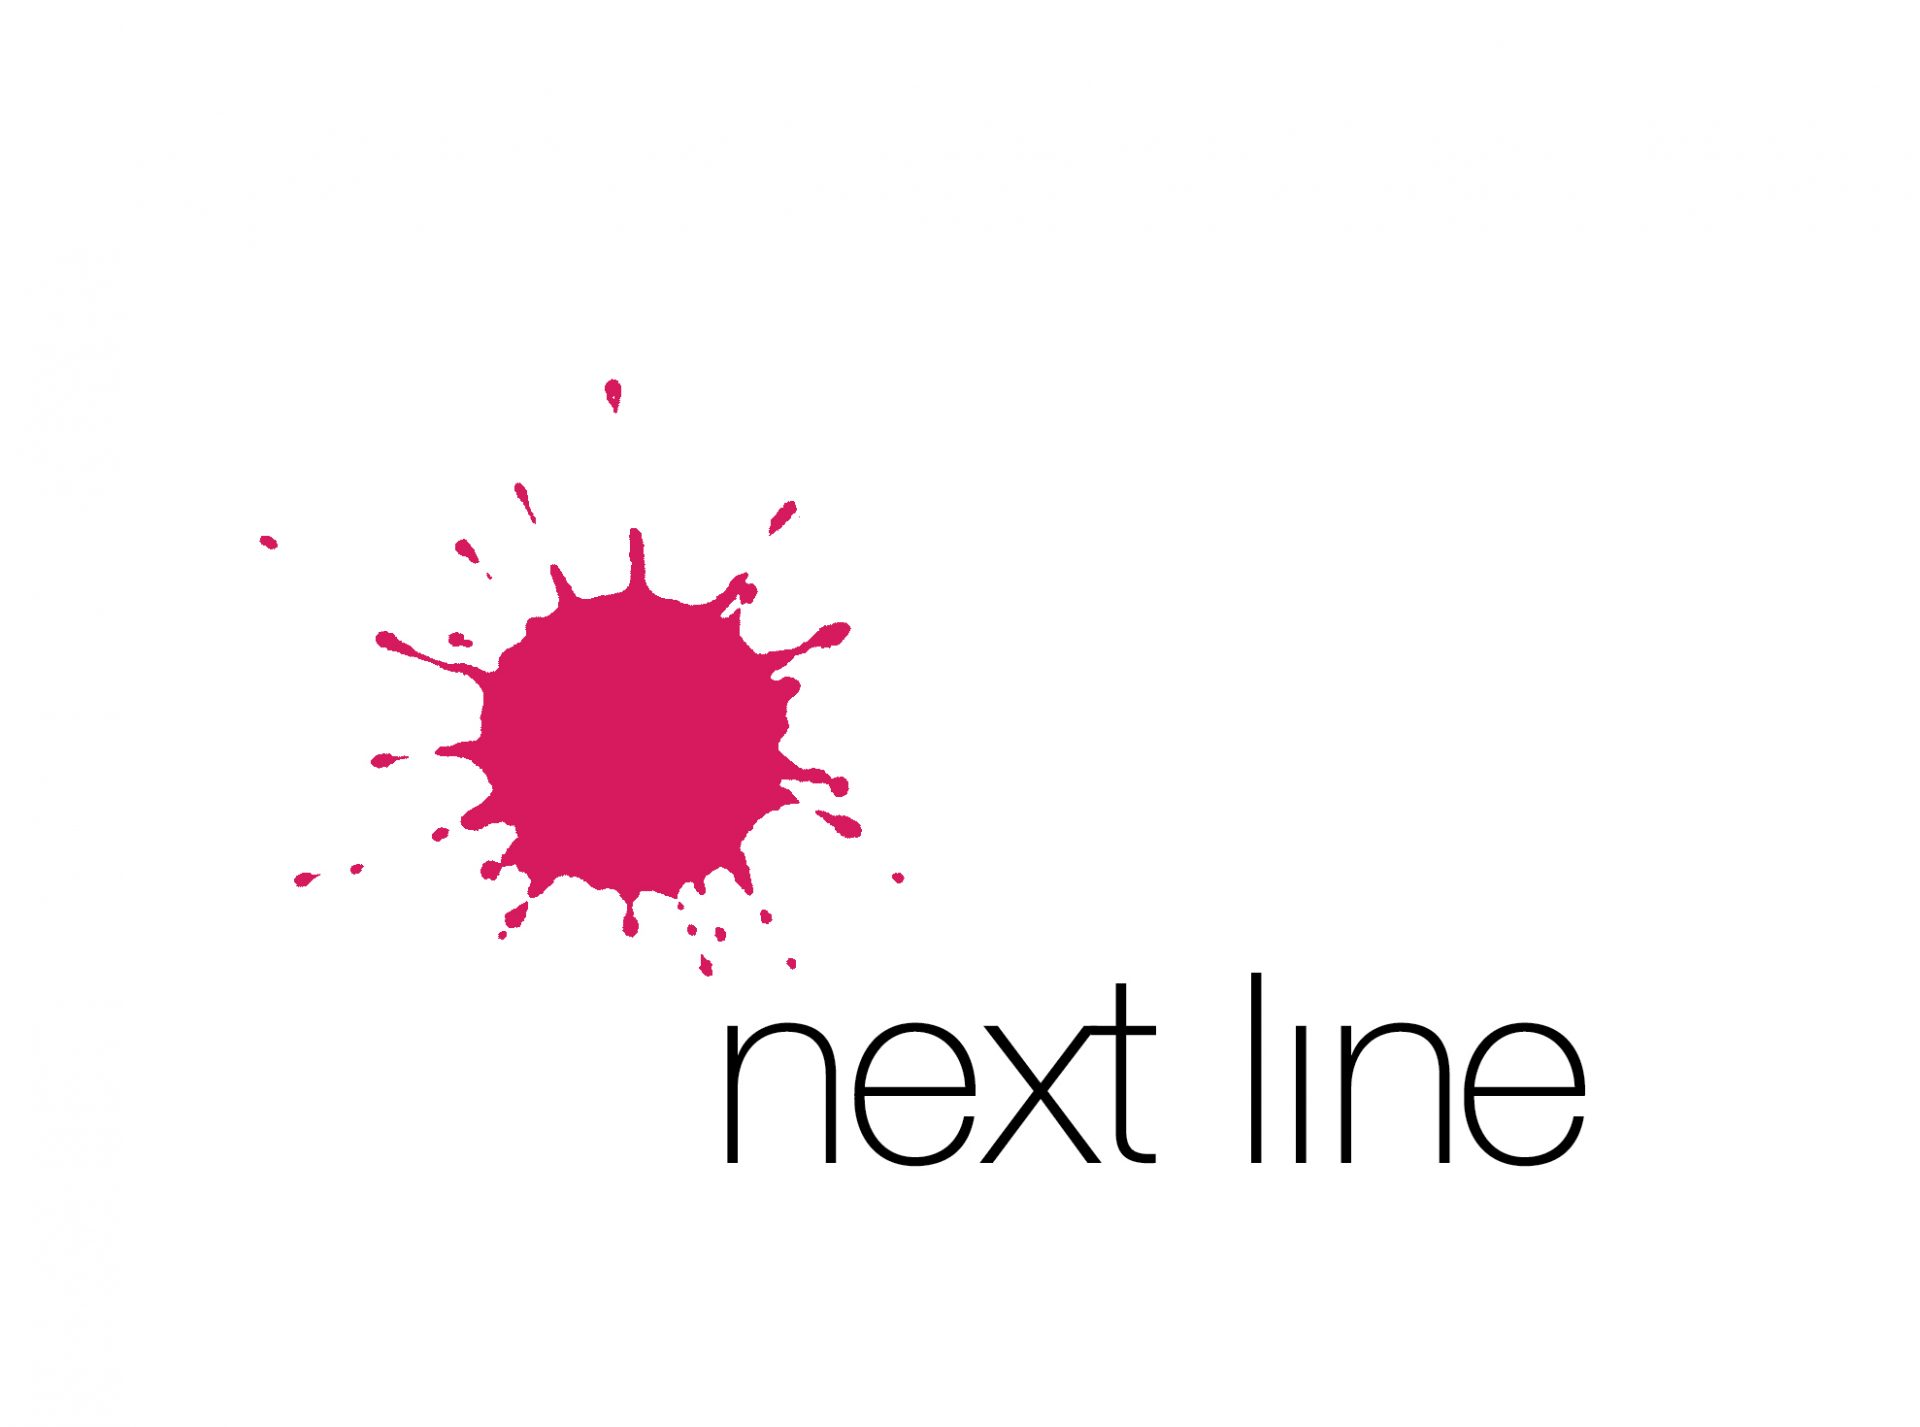 logo-znak-next-line